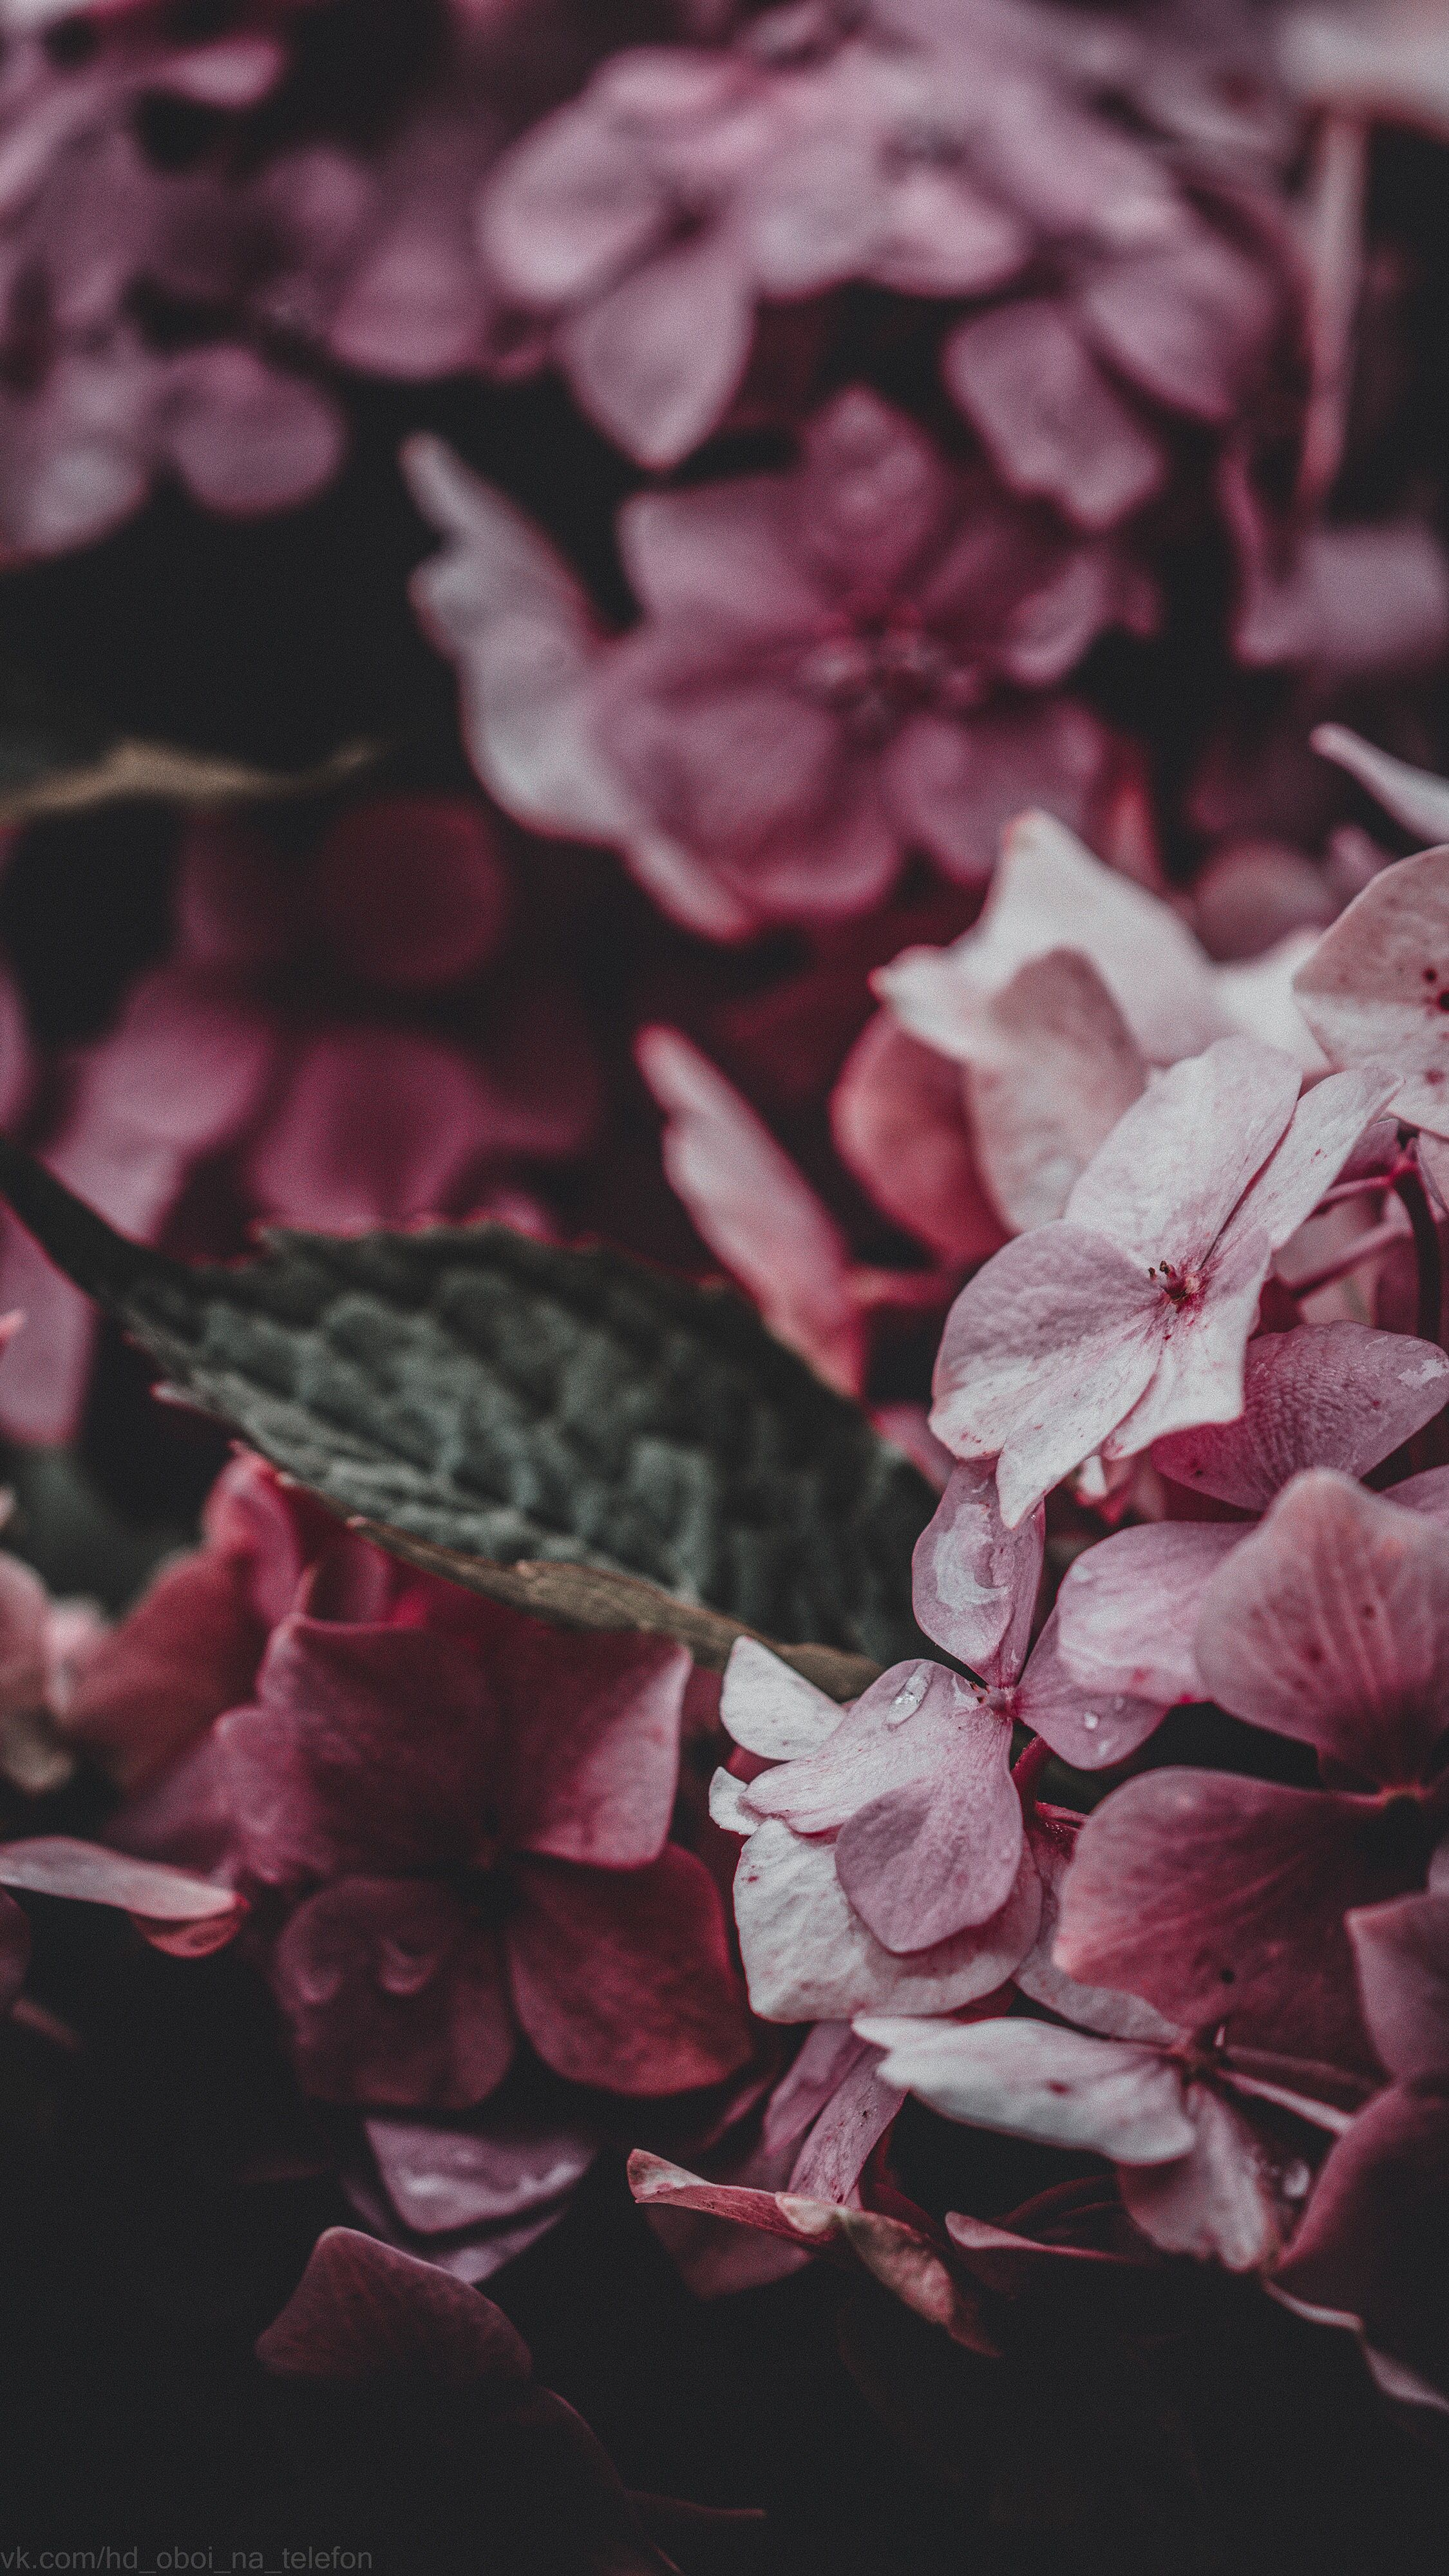 Обои гортензия, цветы, комната. Цветы foto 10